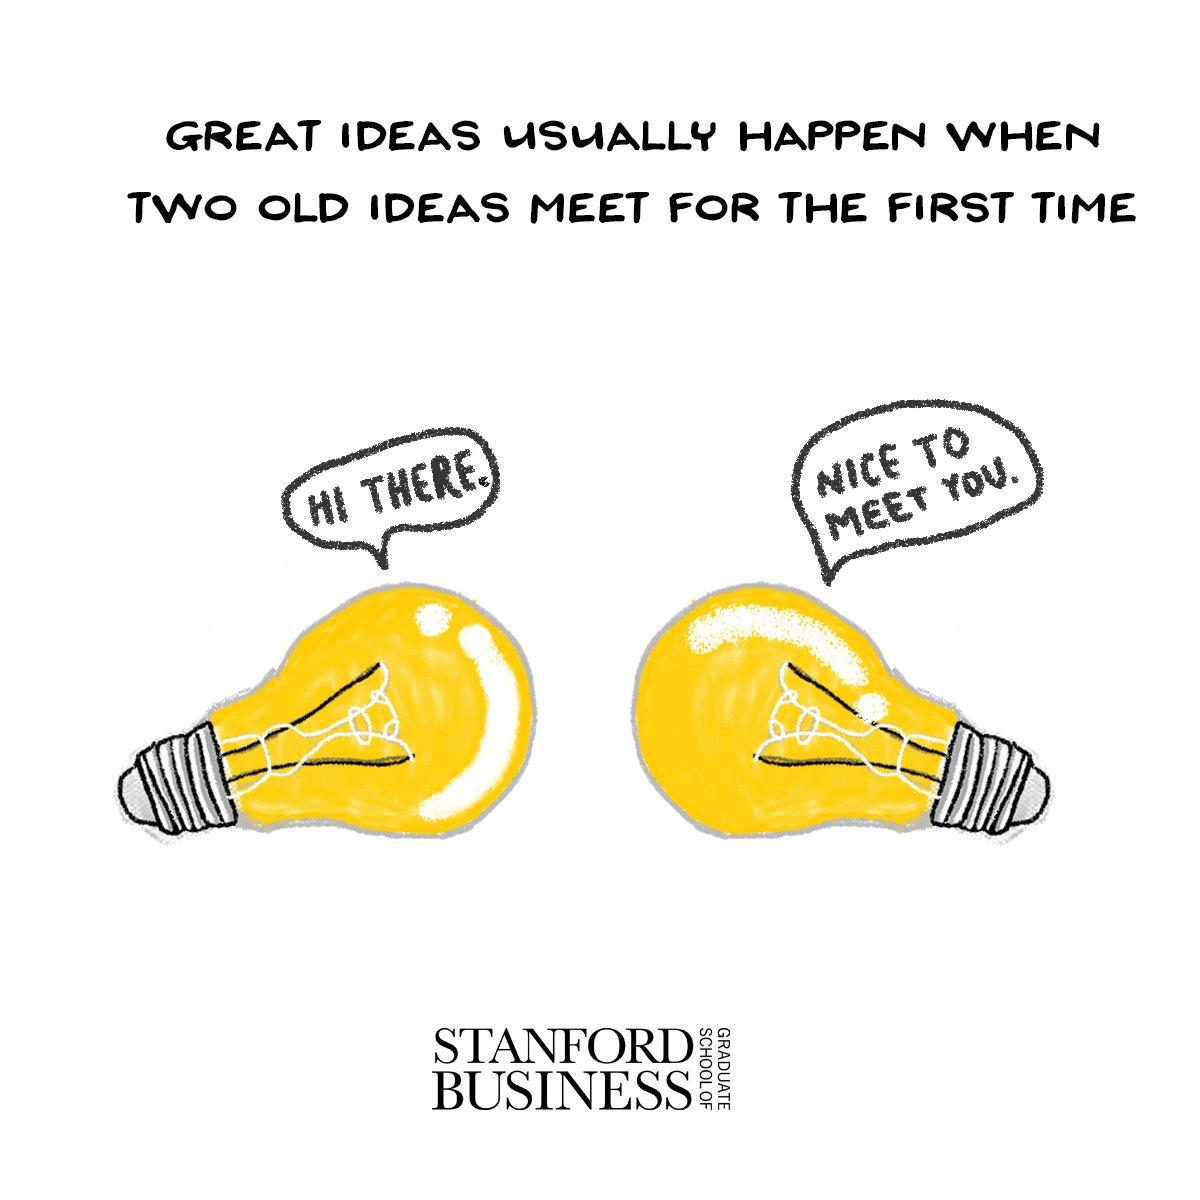 Design thinking improves the creative process https://t.co/6rtAbEbmkW https://t.co/XXk5WaZoaO